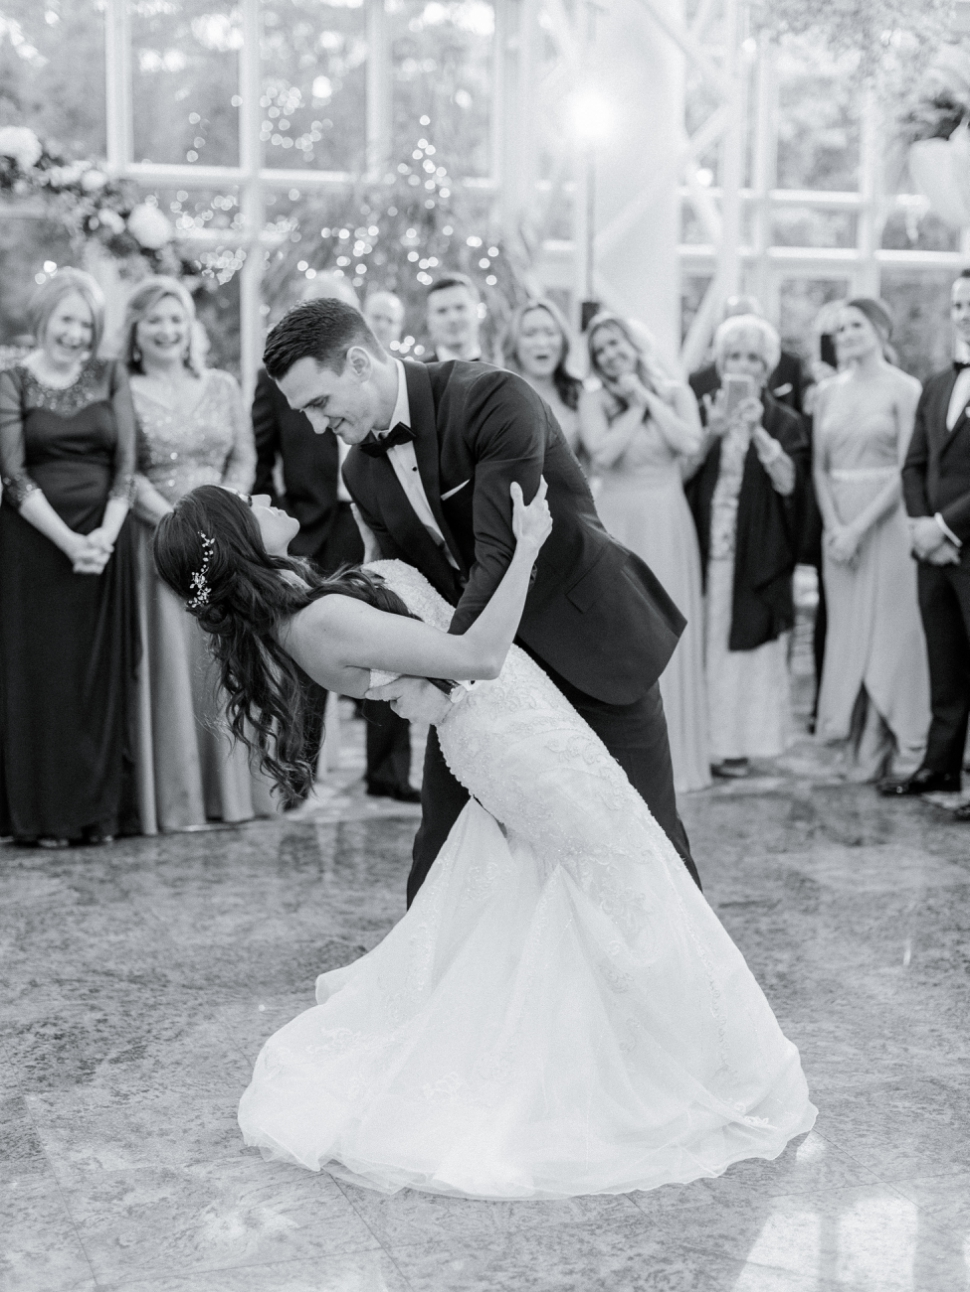 The-Madison-Hotel-Wedding-Photographer-Morristown-NJ-Photographer-Cassi-Claire_36.jpg